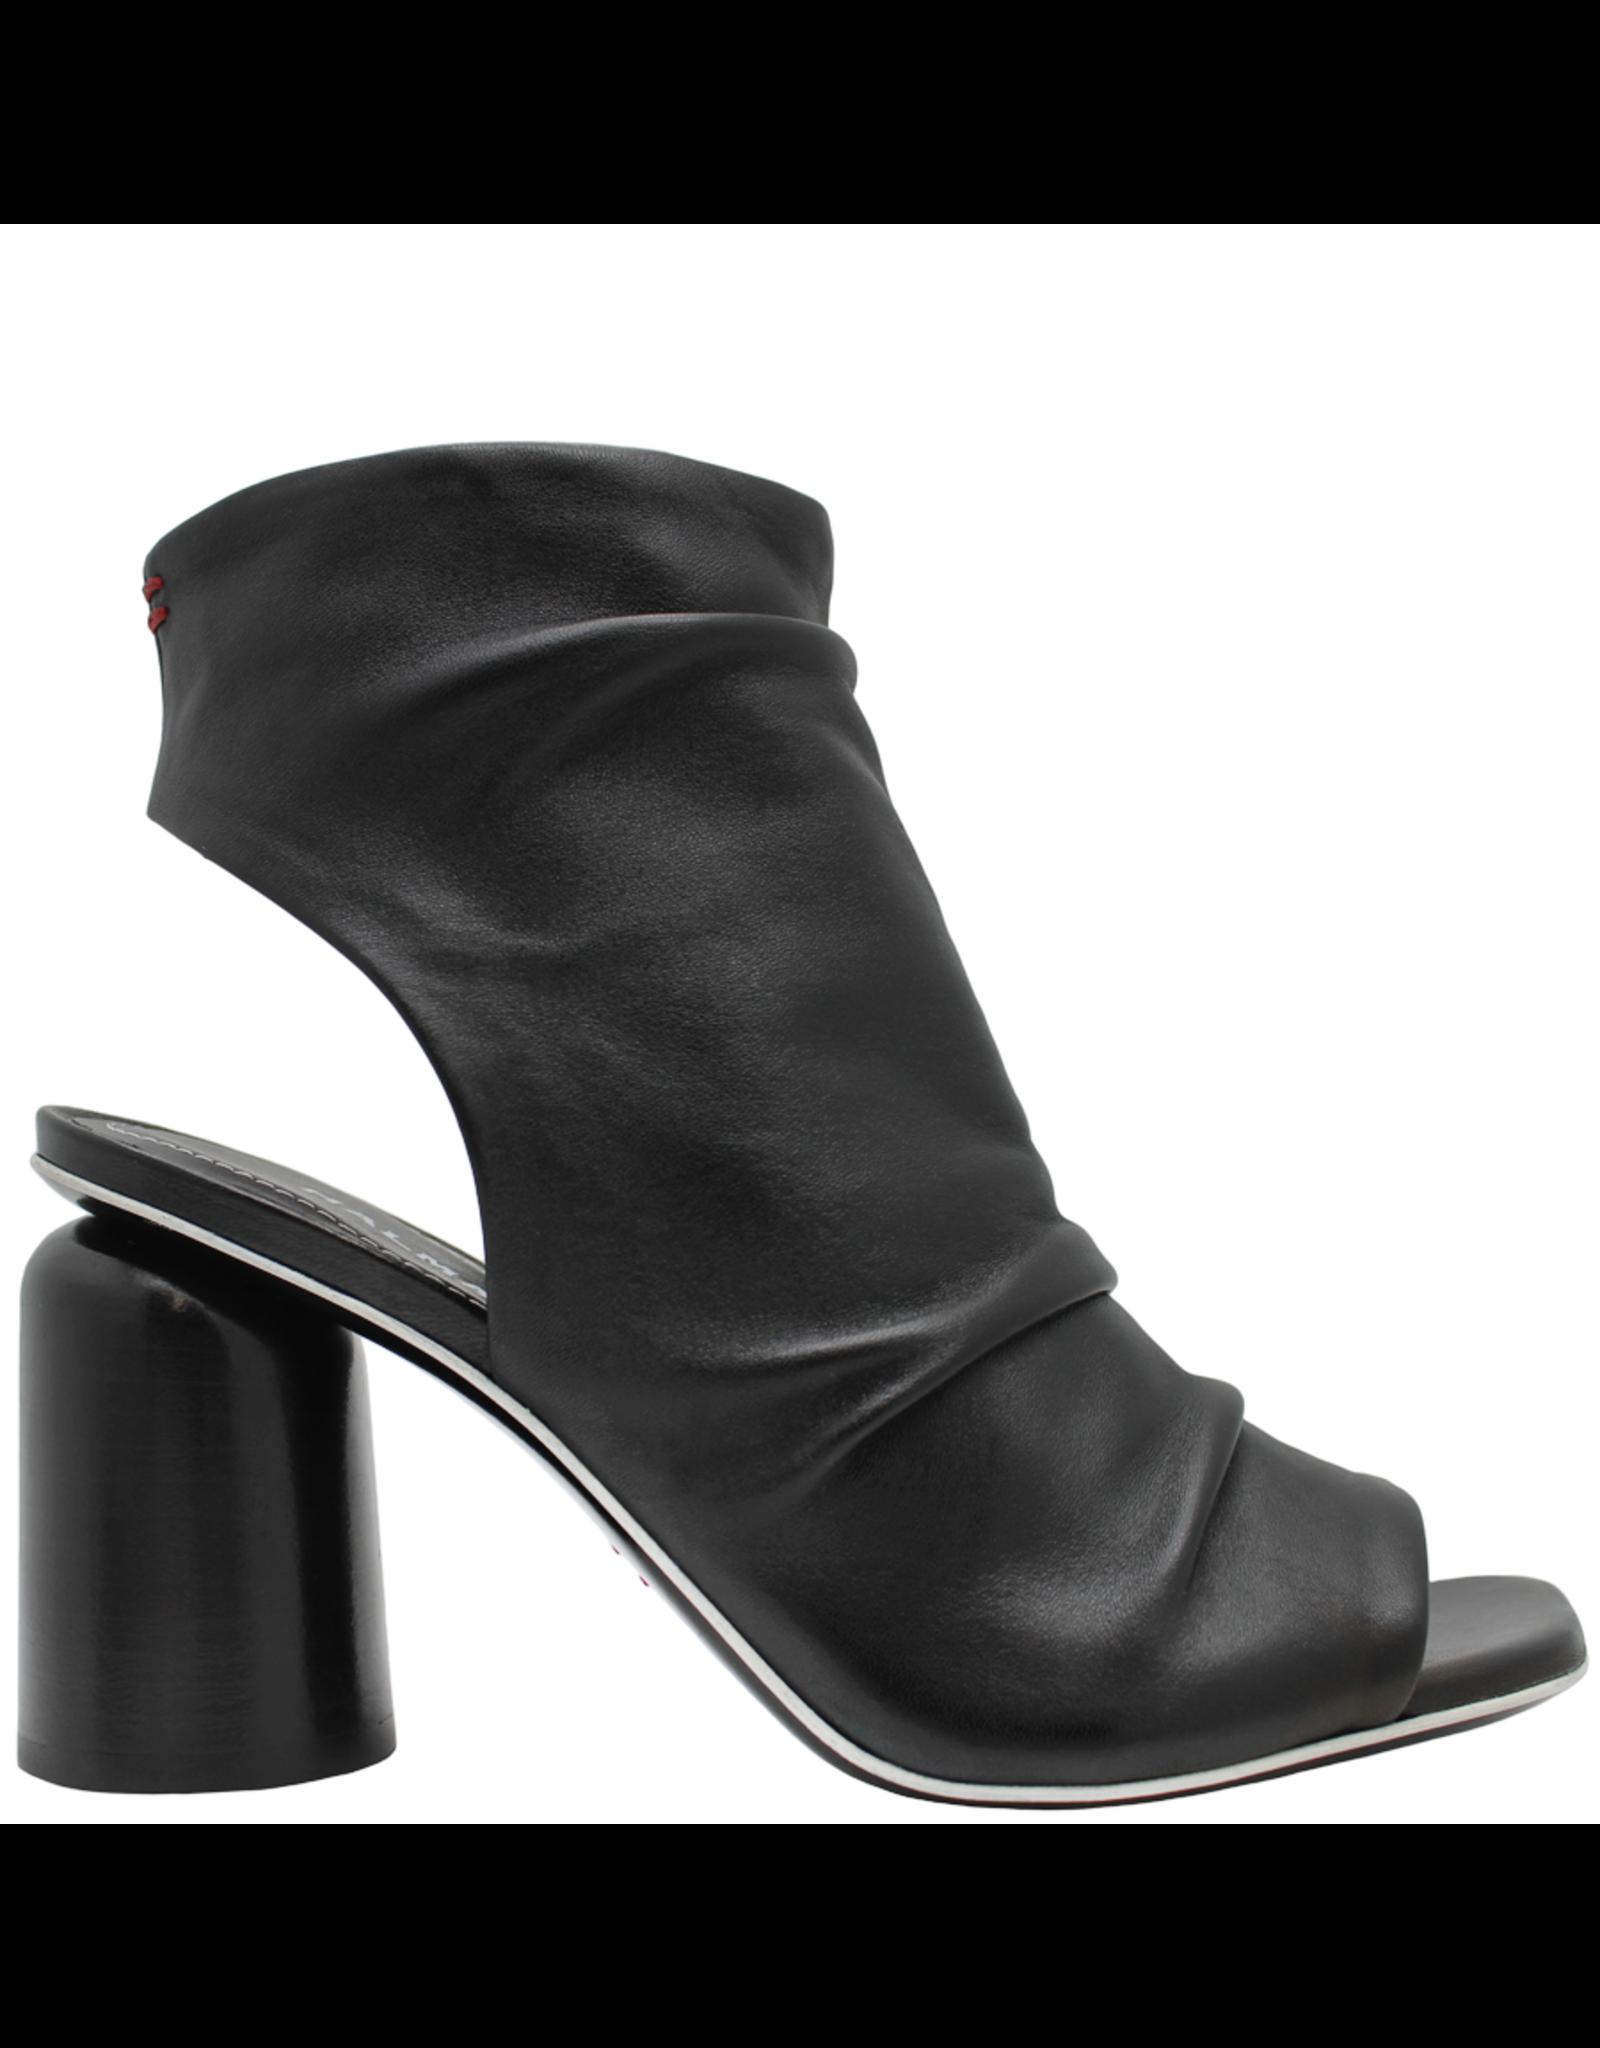 Halmanera Halmanera Black Nappa High Heel Gladiator Sandal 2020